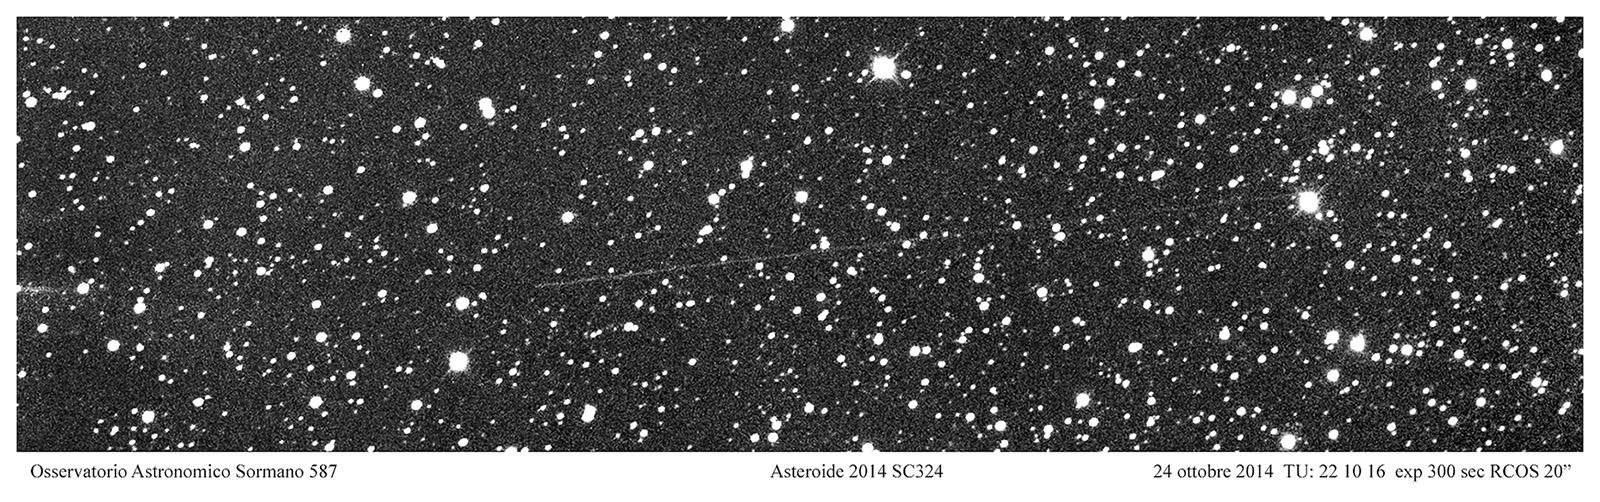 Asteroide 2014 SC324